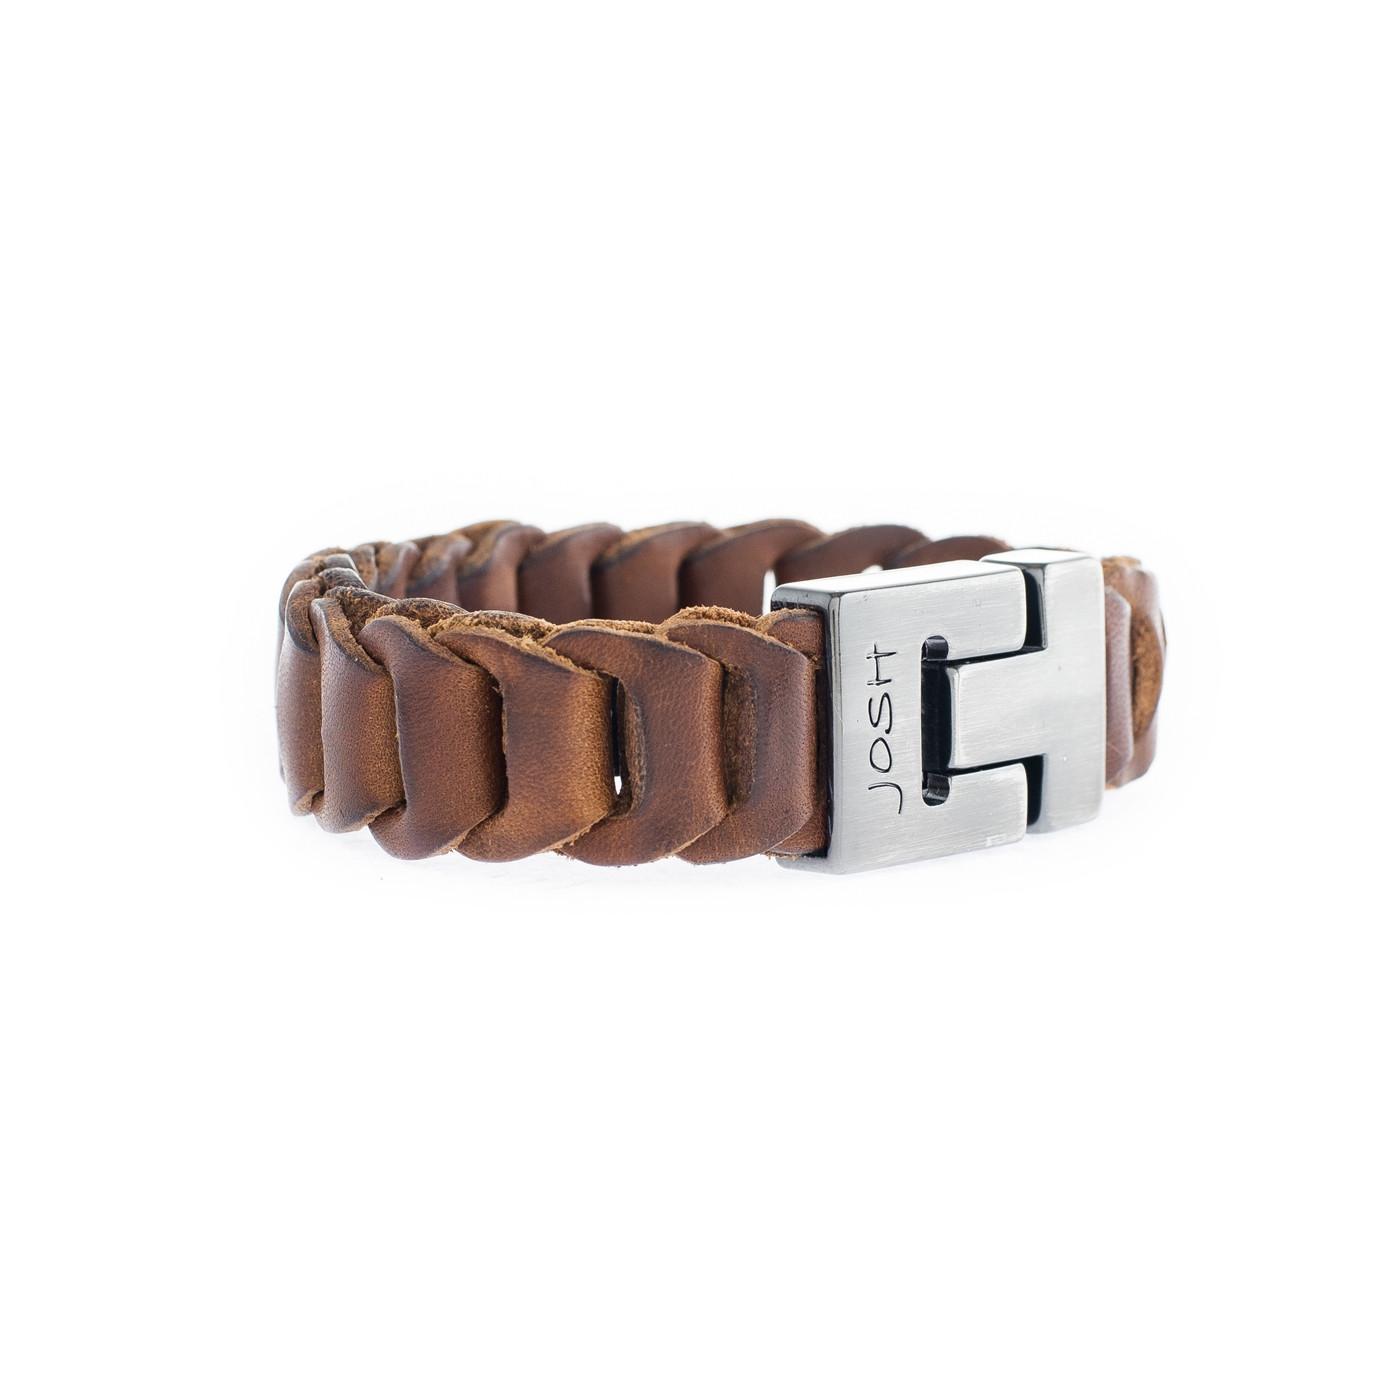 Josh Cognac Armband 24843-SB-COGNAC (Lengte: 21.00-23.00 cm)